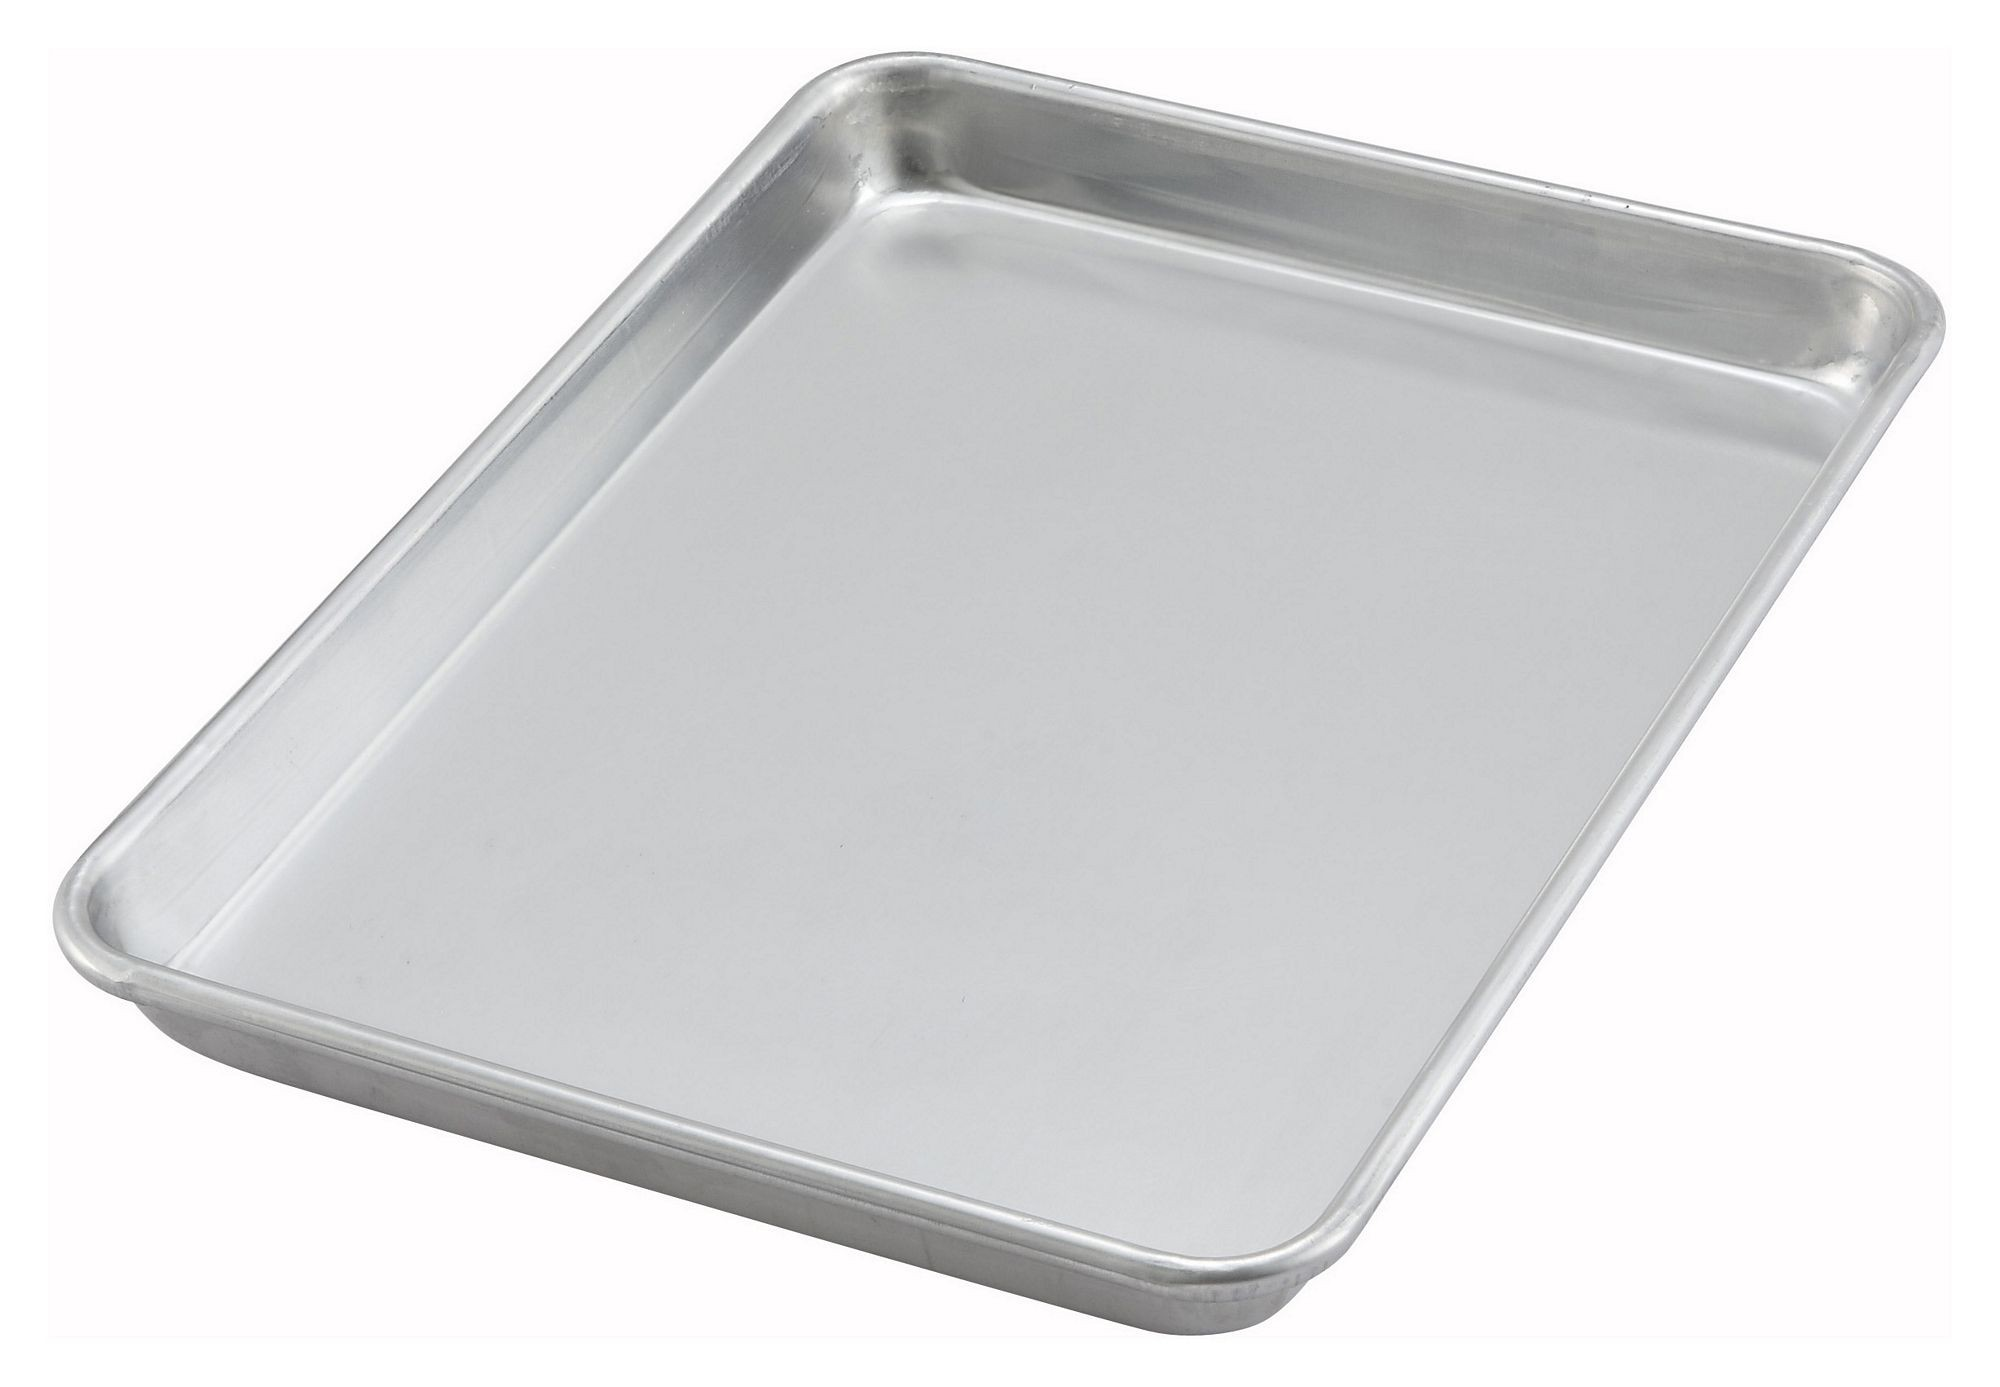 "Winco ALXP-1013 Qt.er-Size Aluminum Sheet Pan, 9-1/2"" x 13"""